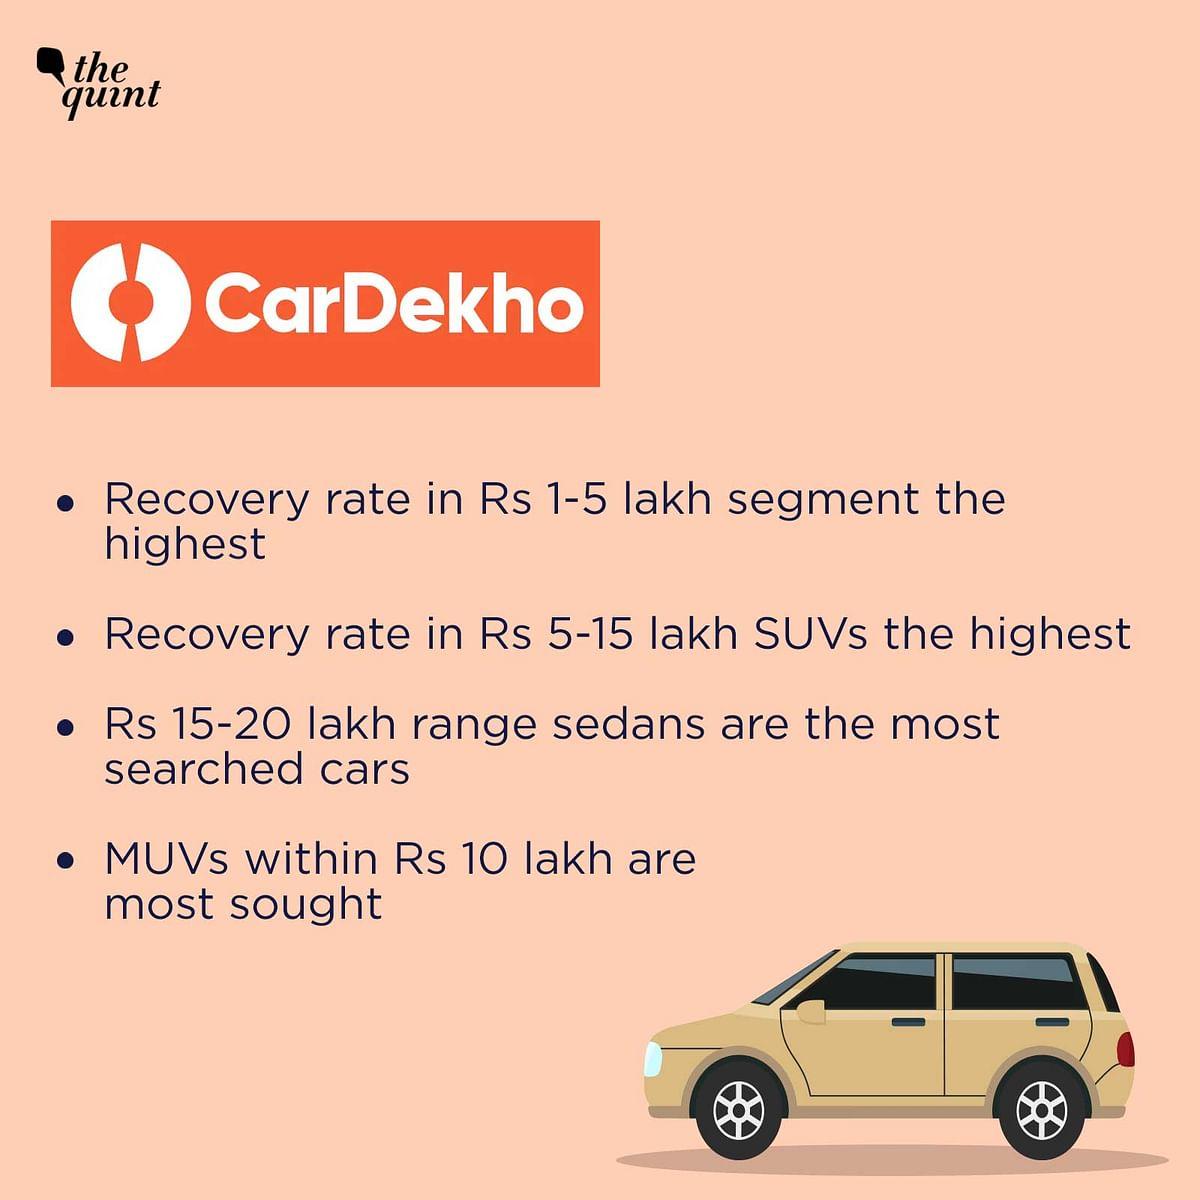 Car search portal CarDekho has seen a rise in demand for sedans.